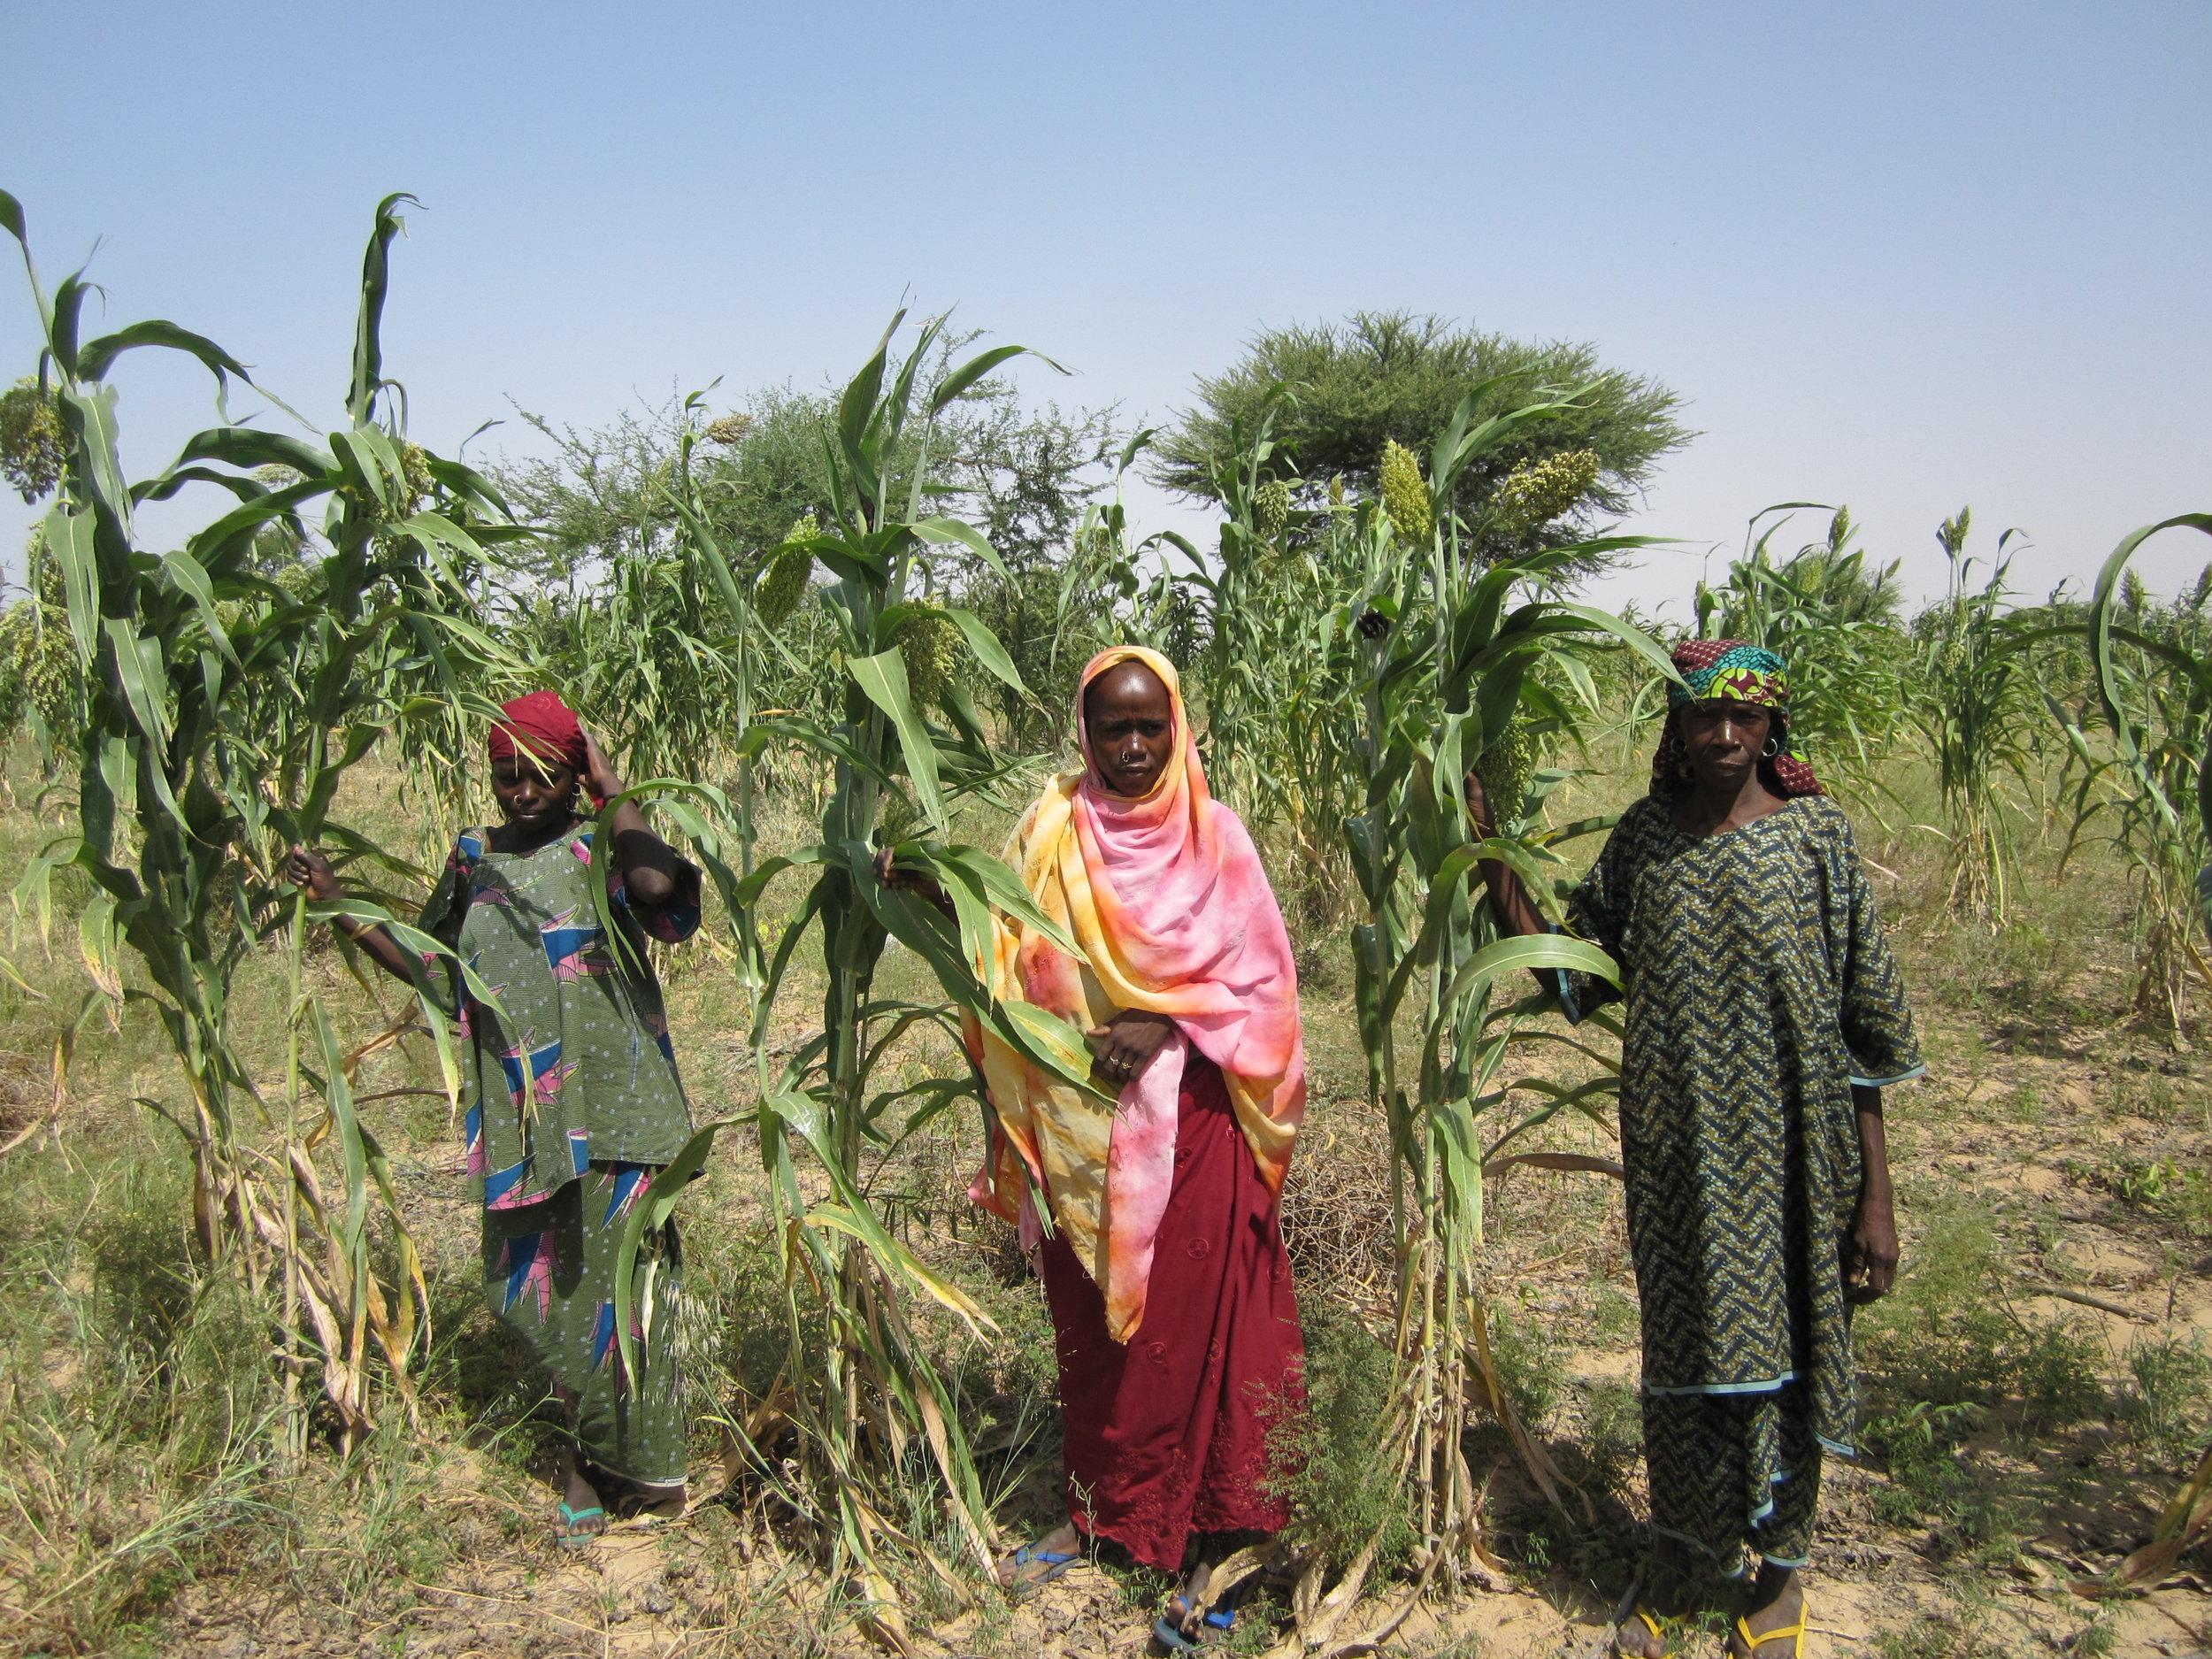 Farmer in northern Nigeria growing improved sorghum